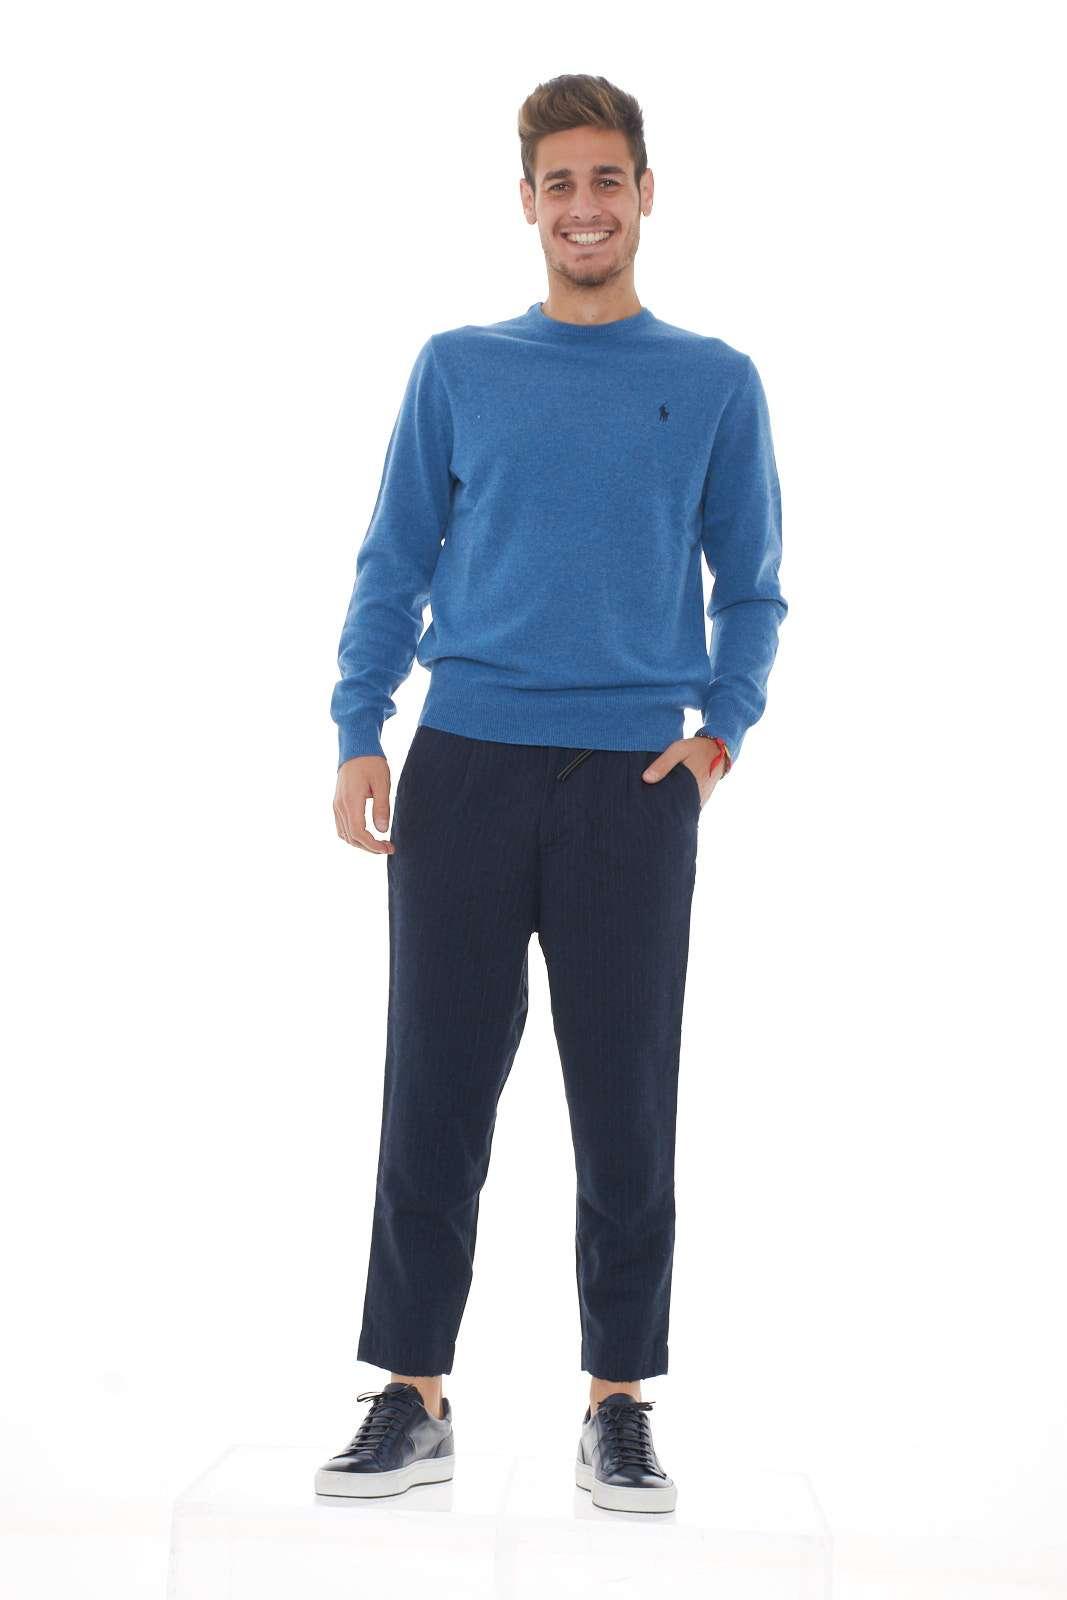 https://www.parmax.com/media/catalog/product/A/I/AI-outlet_parmax-pantaloni-uomo-Squad-qlc9744-D.jpg